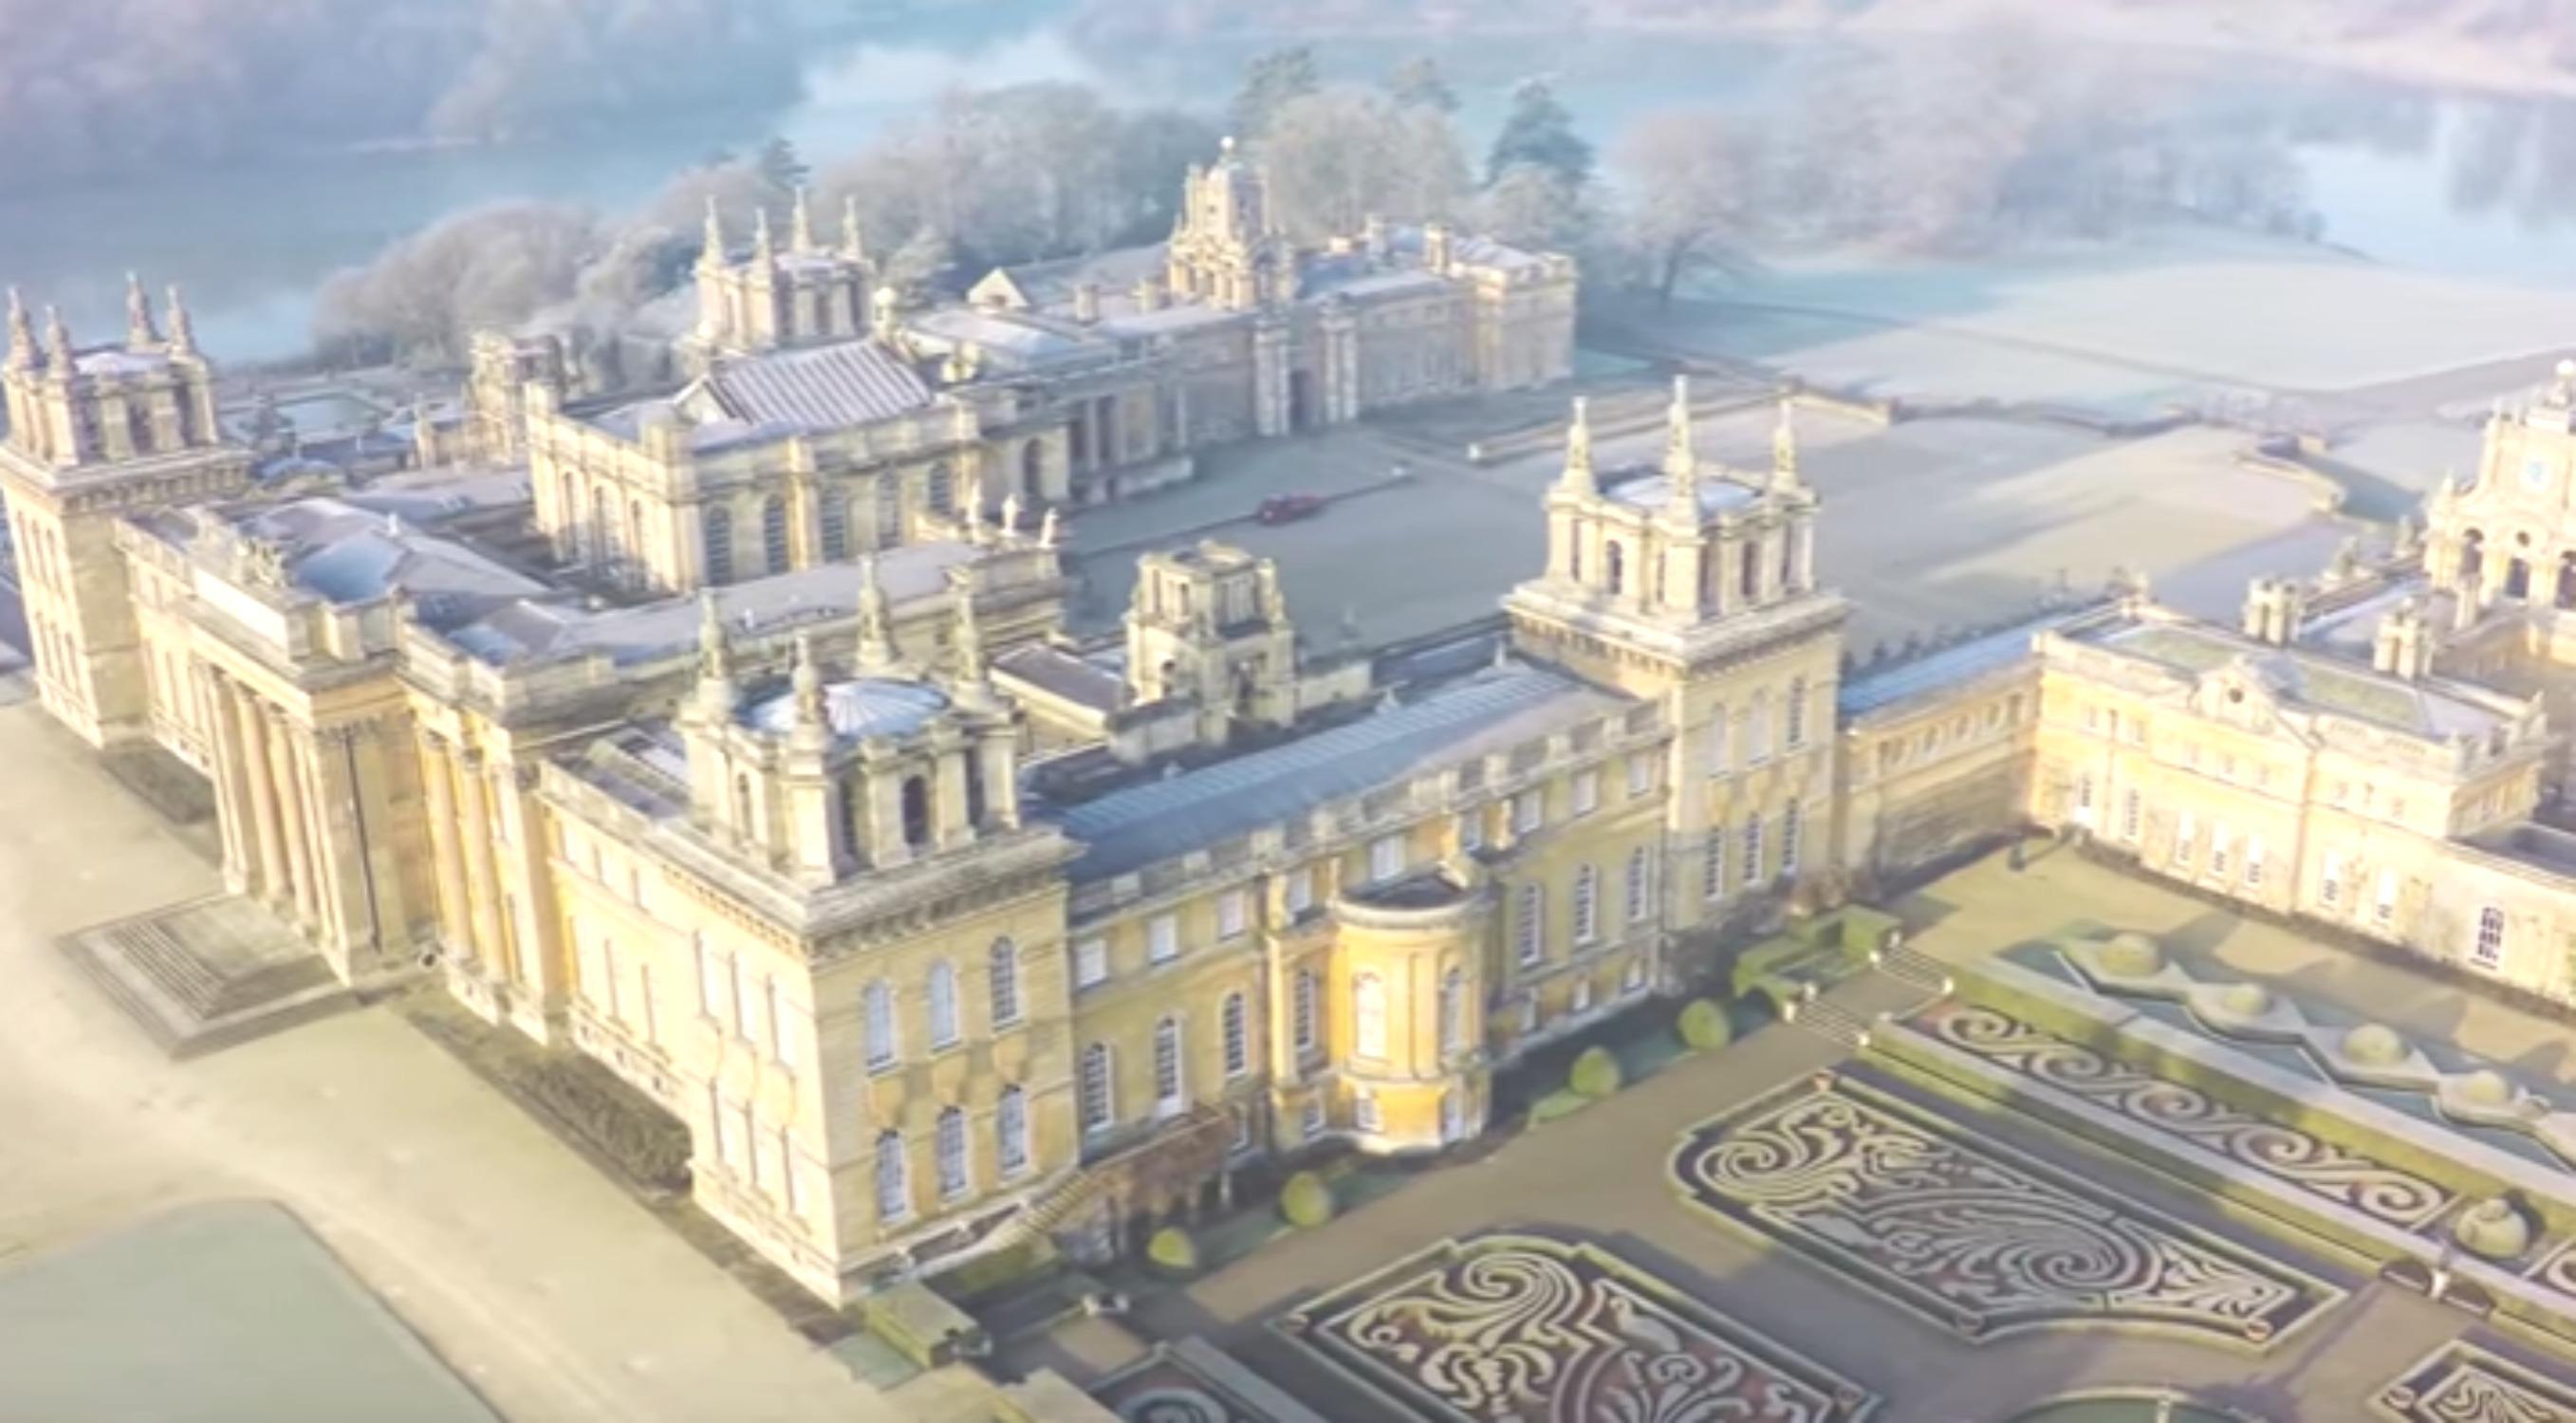 Blenheim Palace Under Frost